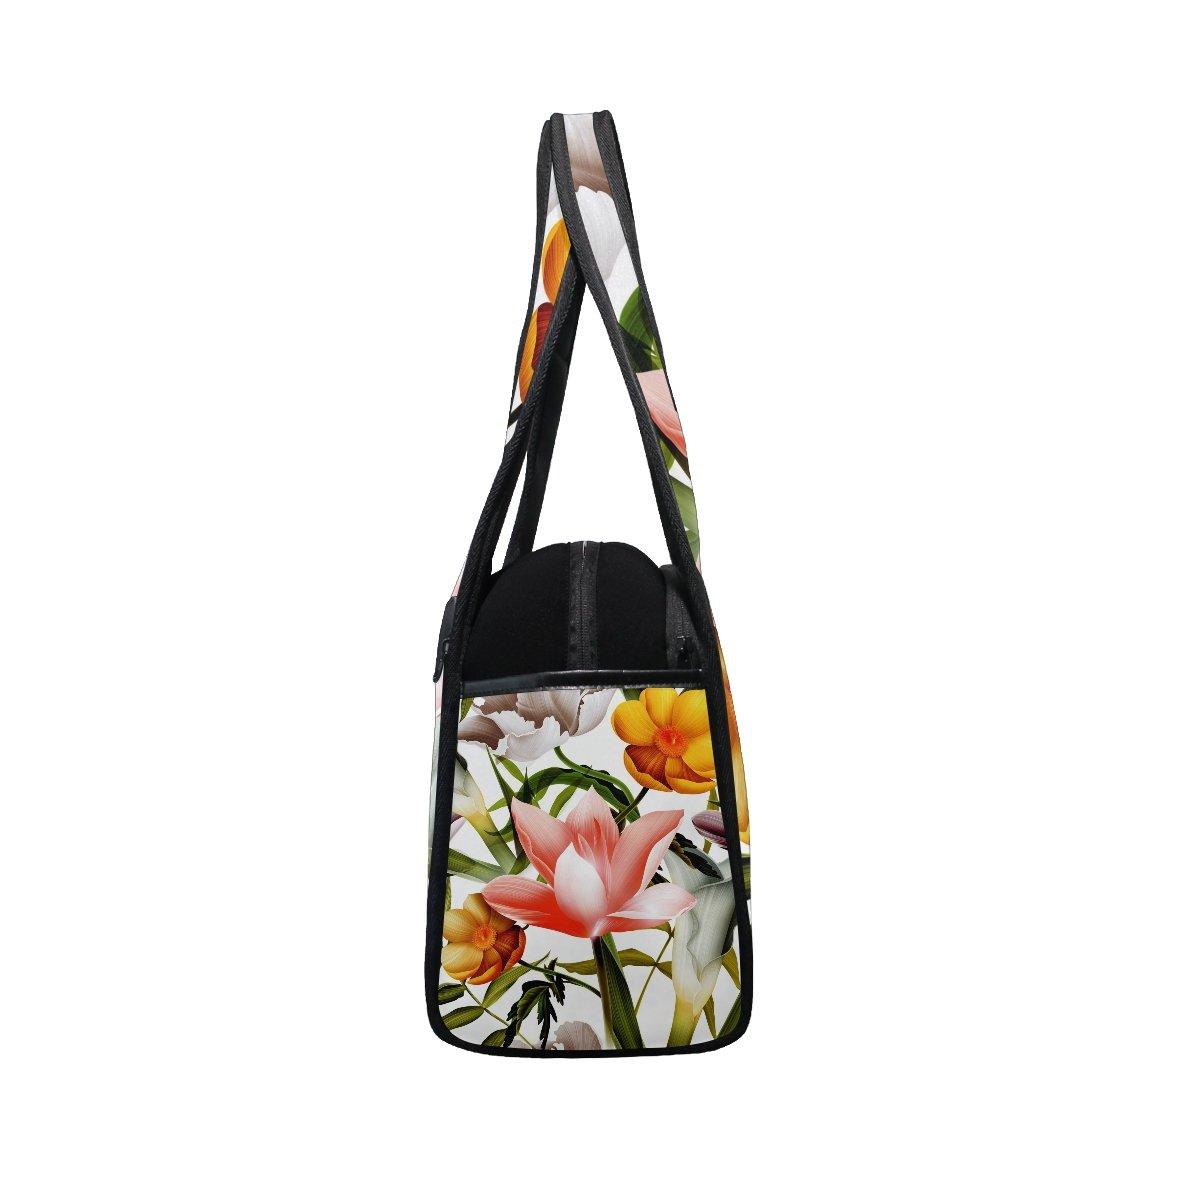 Gym Bag Sports Holdall Tropical Poppy Flowers Leaf Canvas Shoulder Bag Overnight Travel Bag for Men and Women